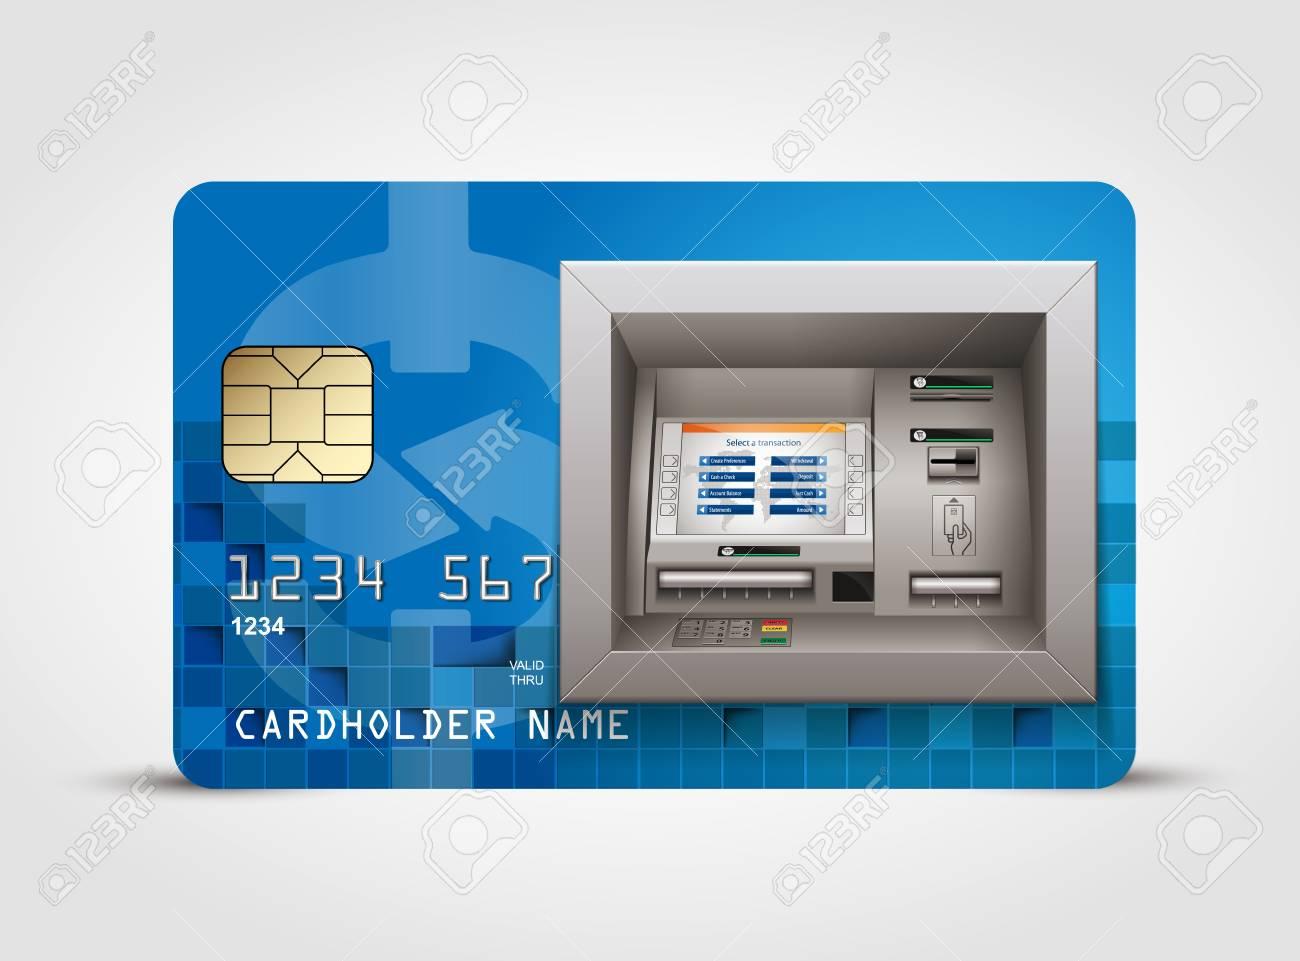 ATM - 現金自動預け払い機 - 現金の概念のイラスト素材・ベクタ ...